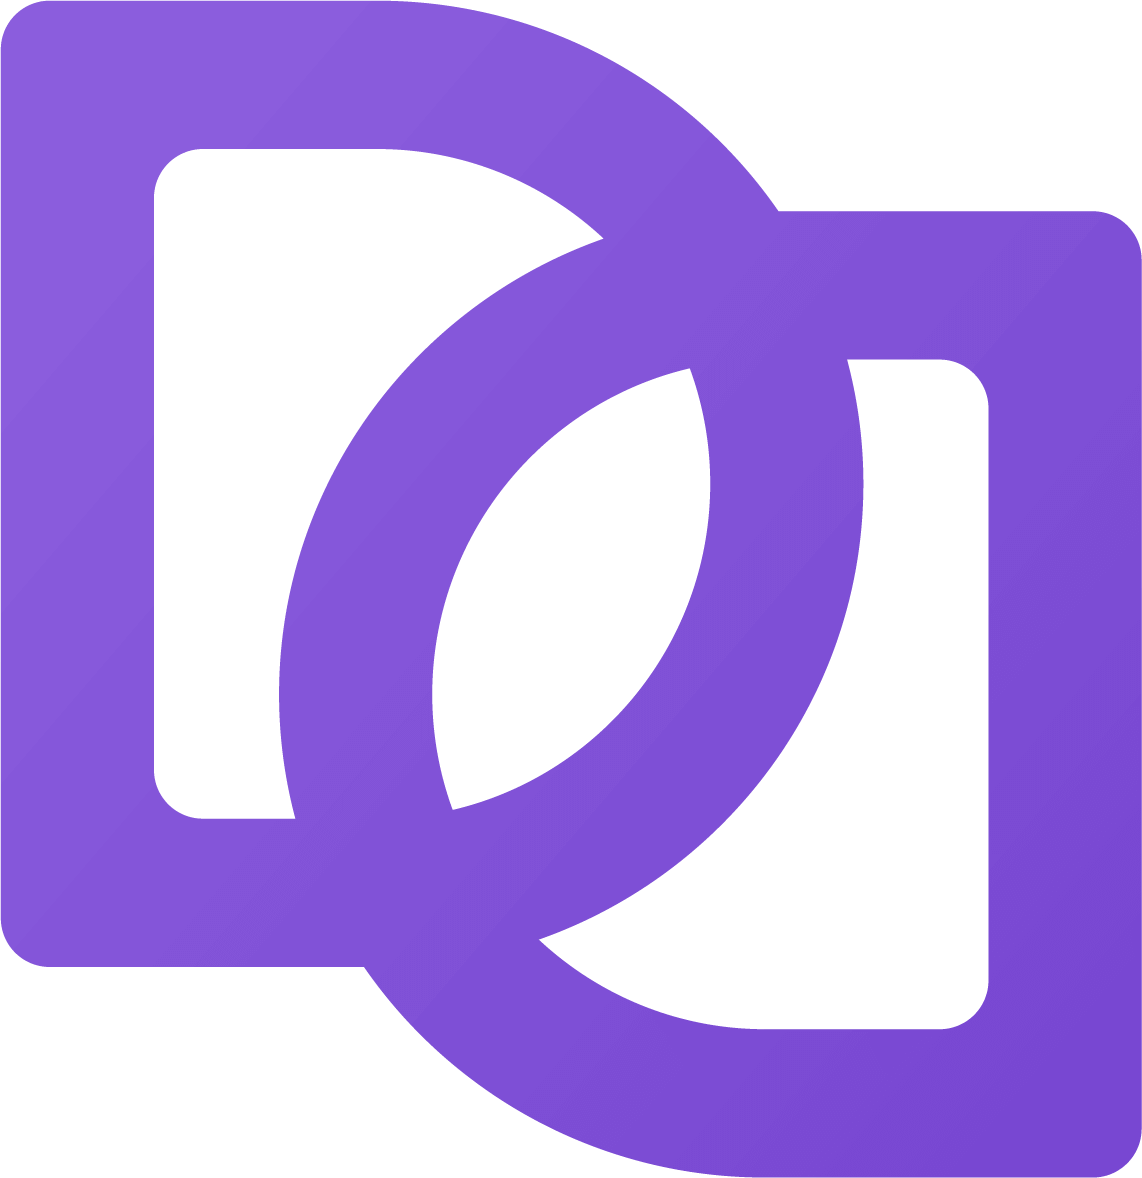 deats logo